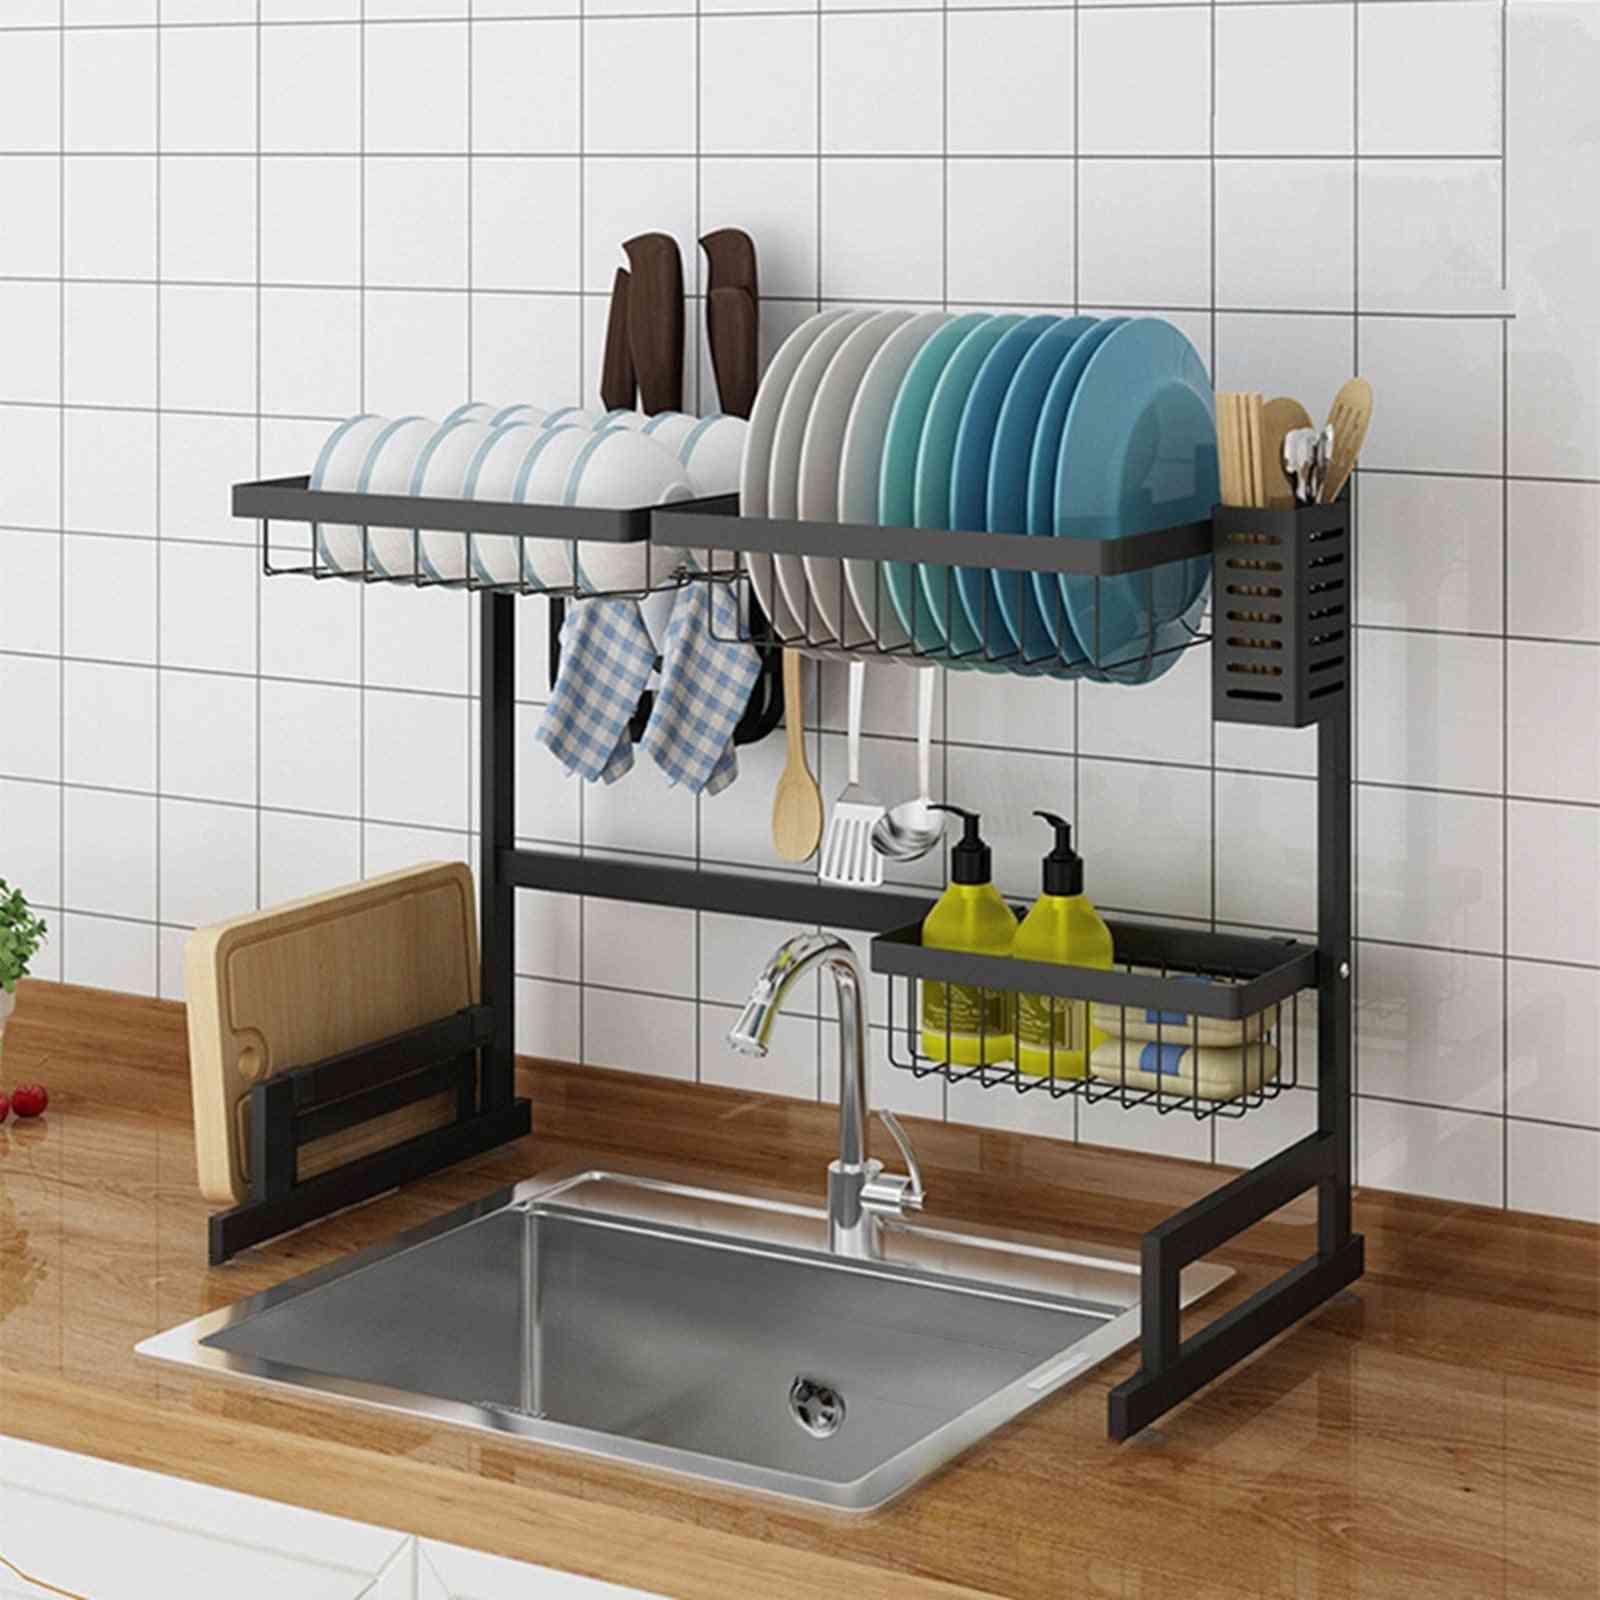 Dish Drying Rack Over Sink Display Drainer Kitchen Utensils Holder Us